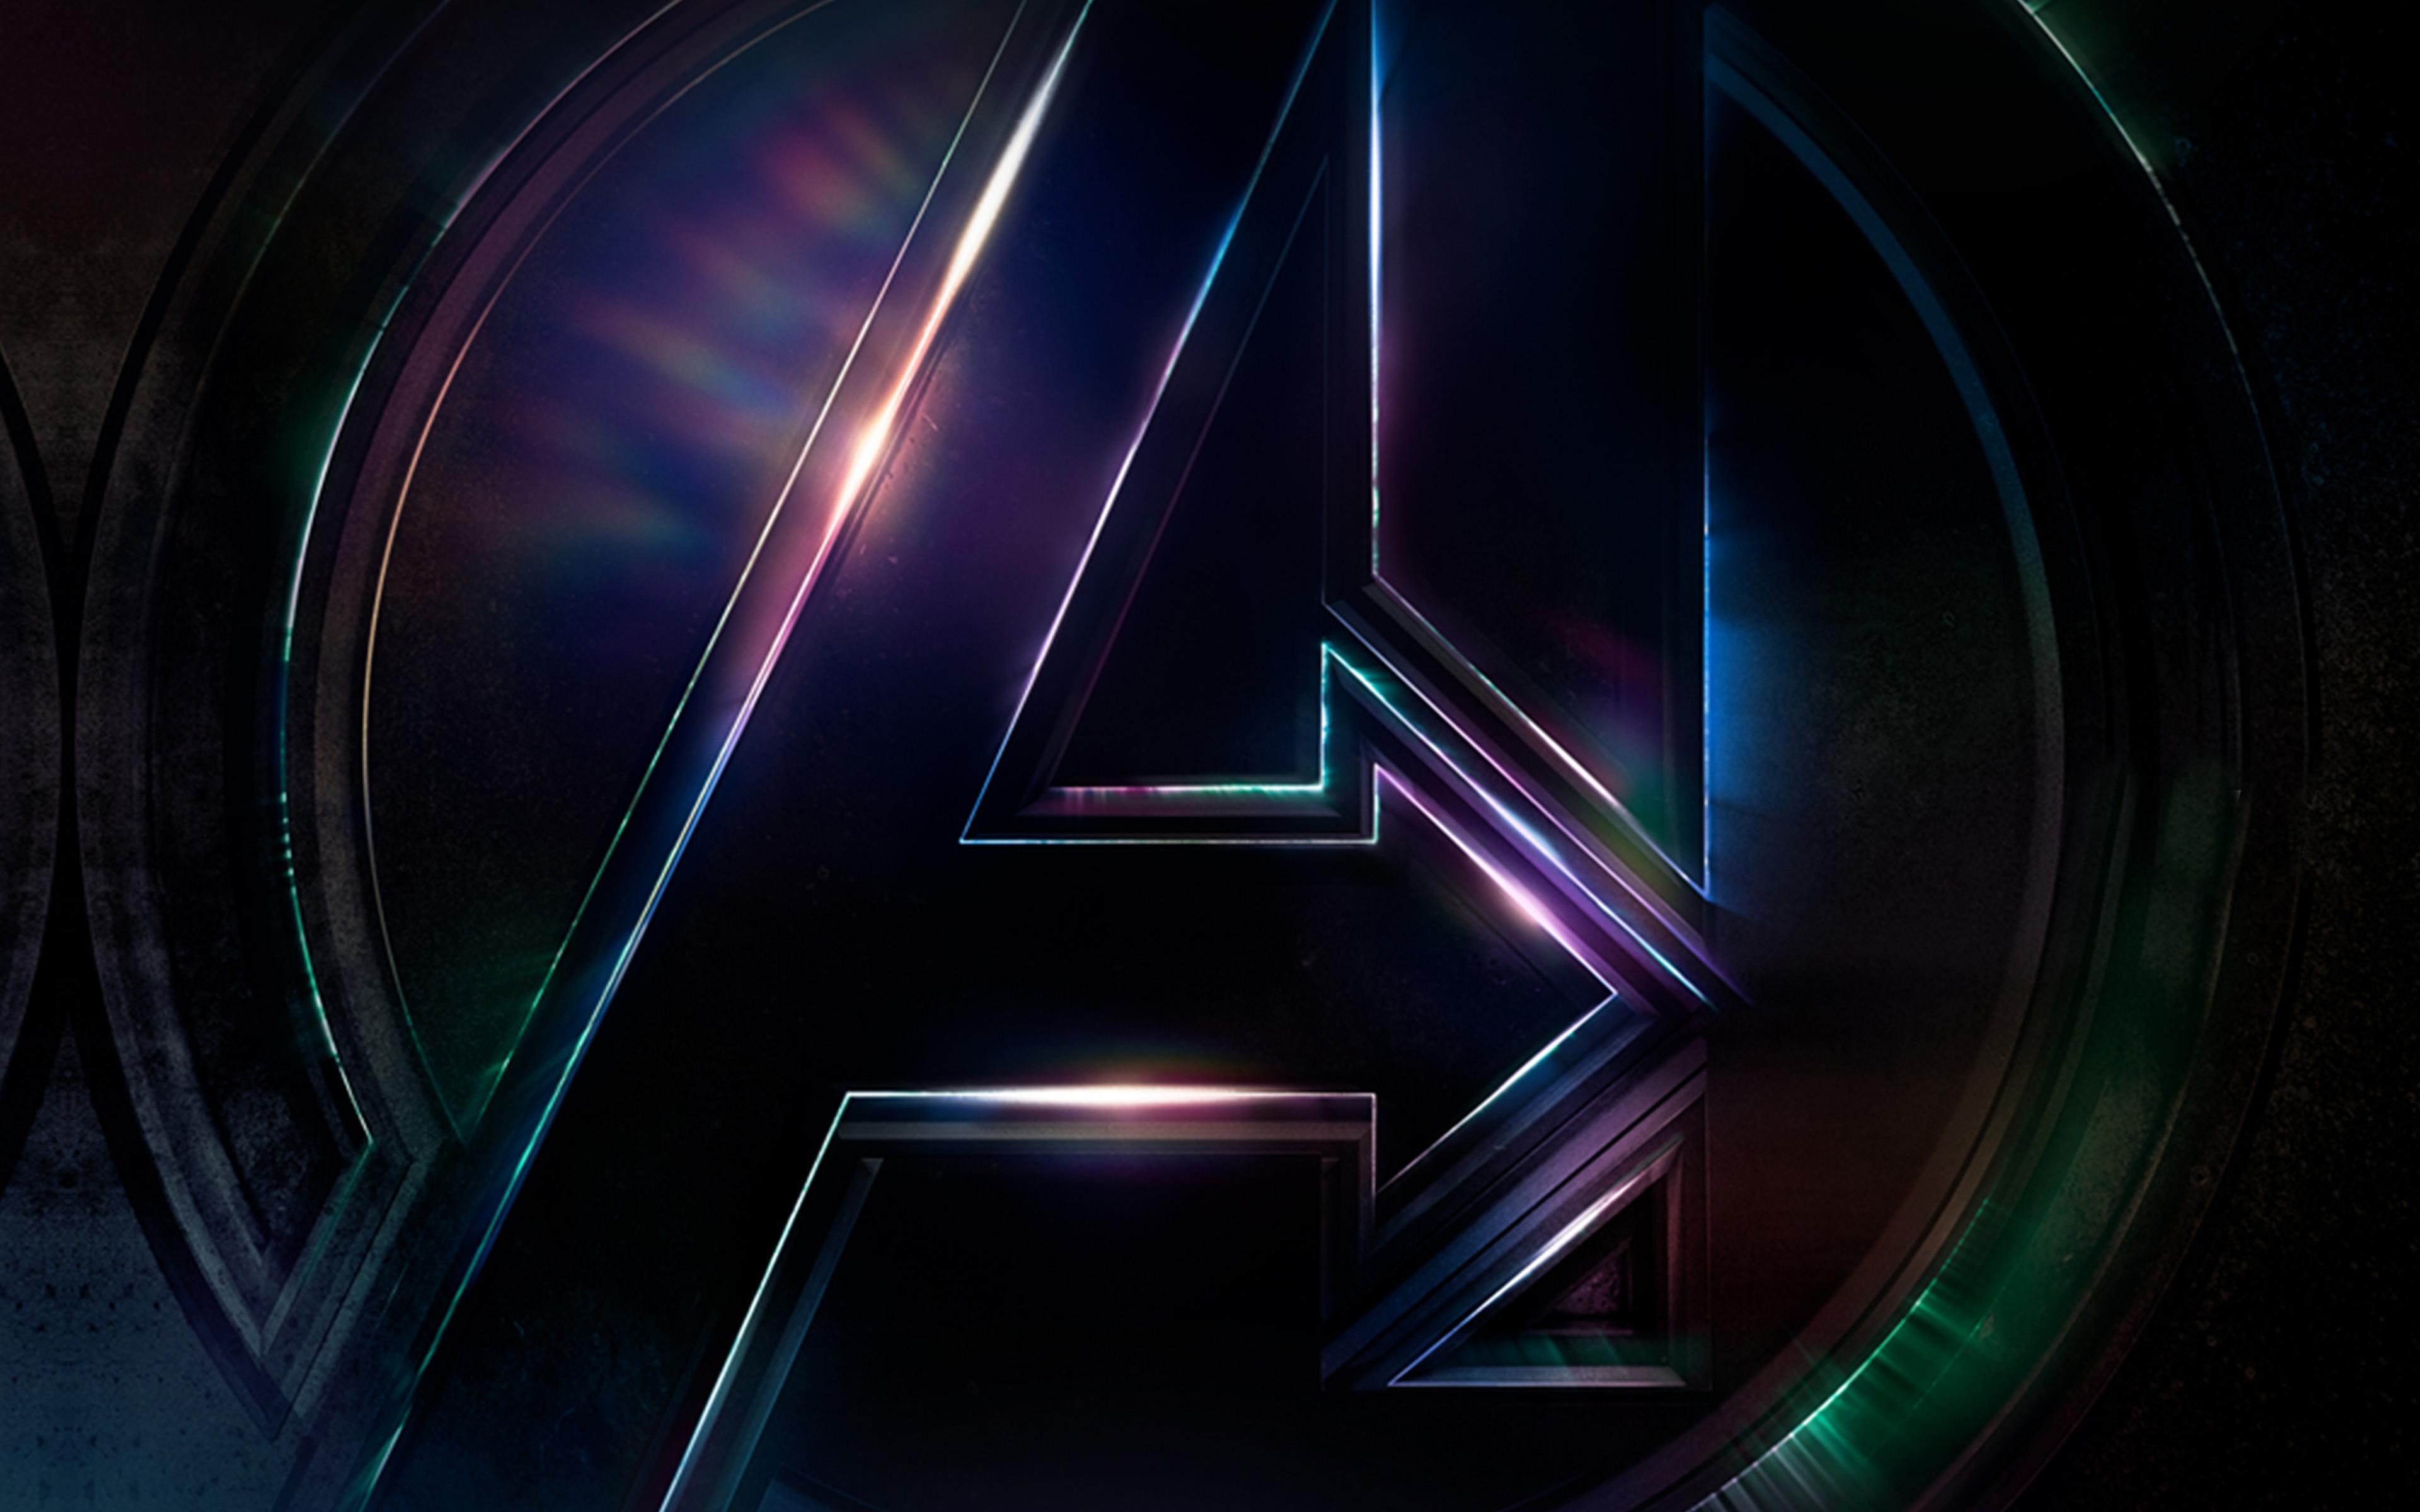 Desktop Wallpaper Hd Fall Be49 Avengers Logo Dark Film Art Illustration Marvel Wallpaper